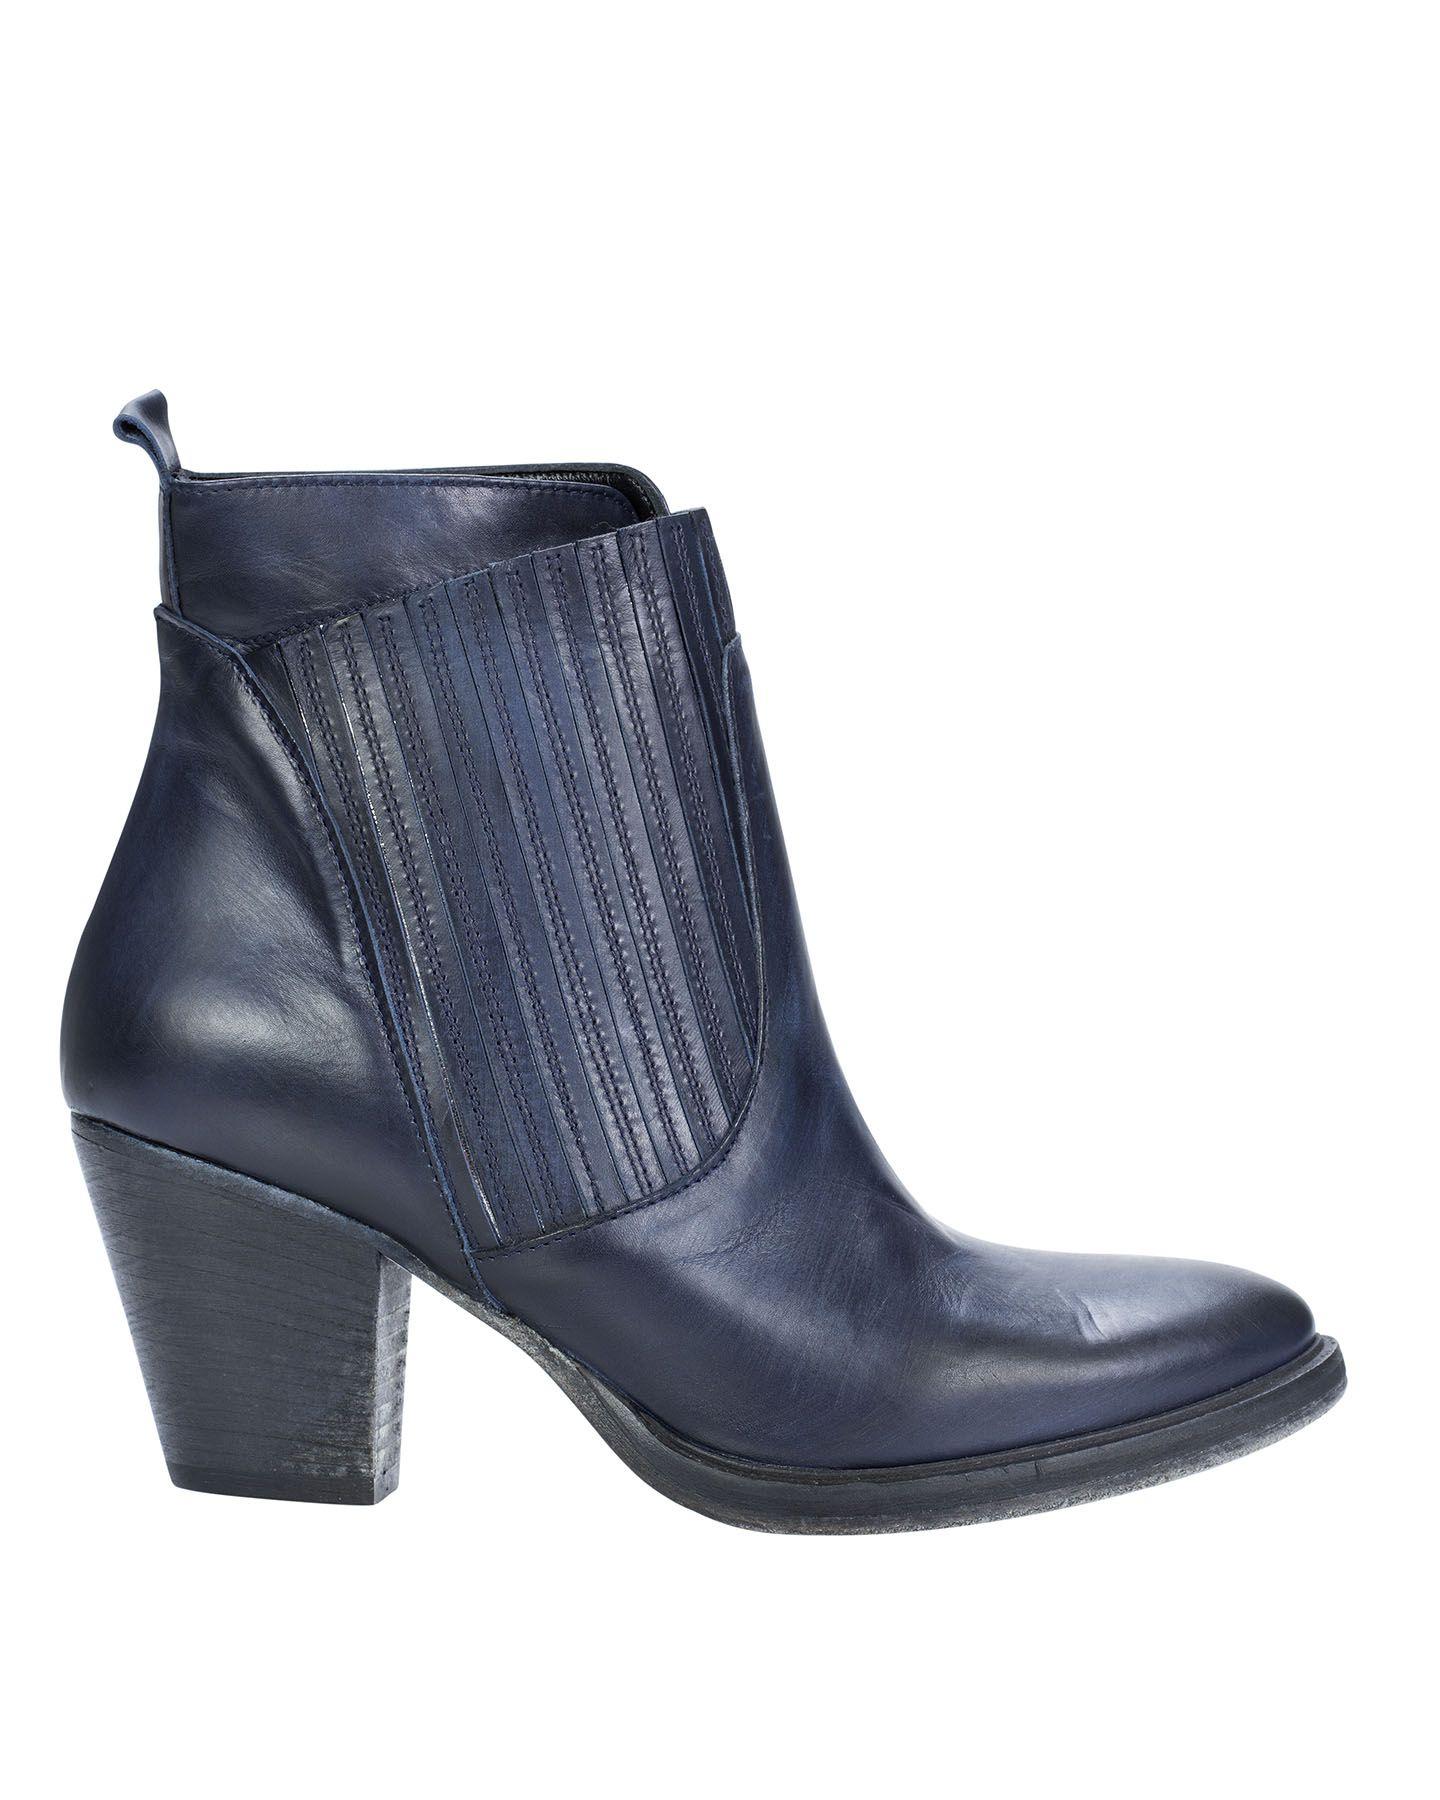 "Dapatkan Heels & Wedges Buccheri hanya di Prelo App Jual Beli line Ratusan Seller Terpercaya Rekber Buccheri Shoes """